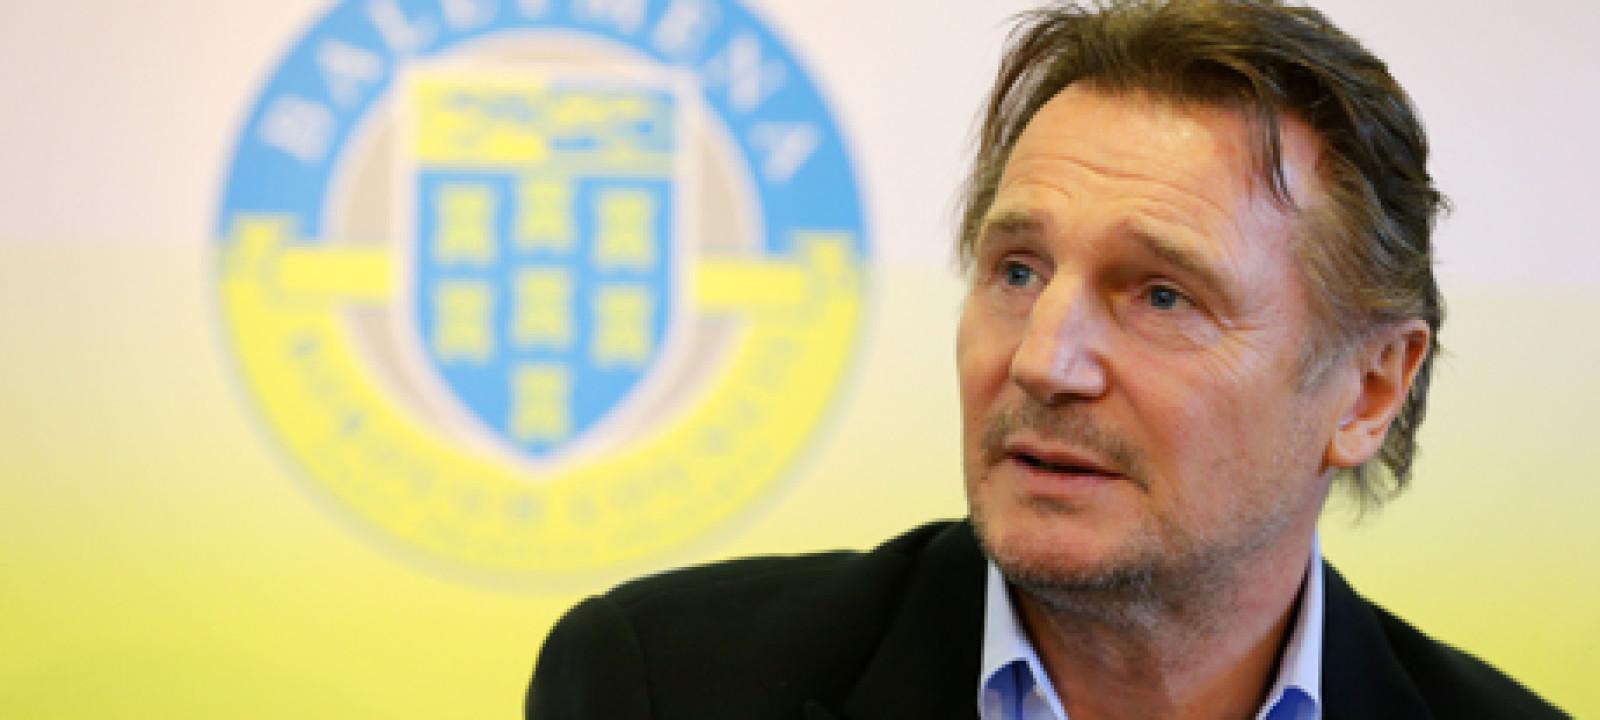 Liam Neeson awarded Honorary Freedom of Ballymena Borough, Belfa